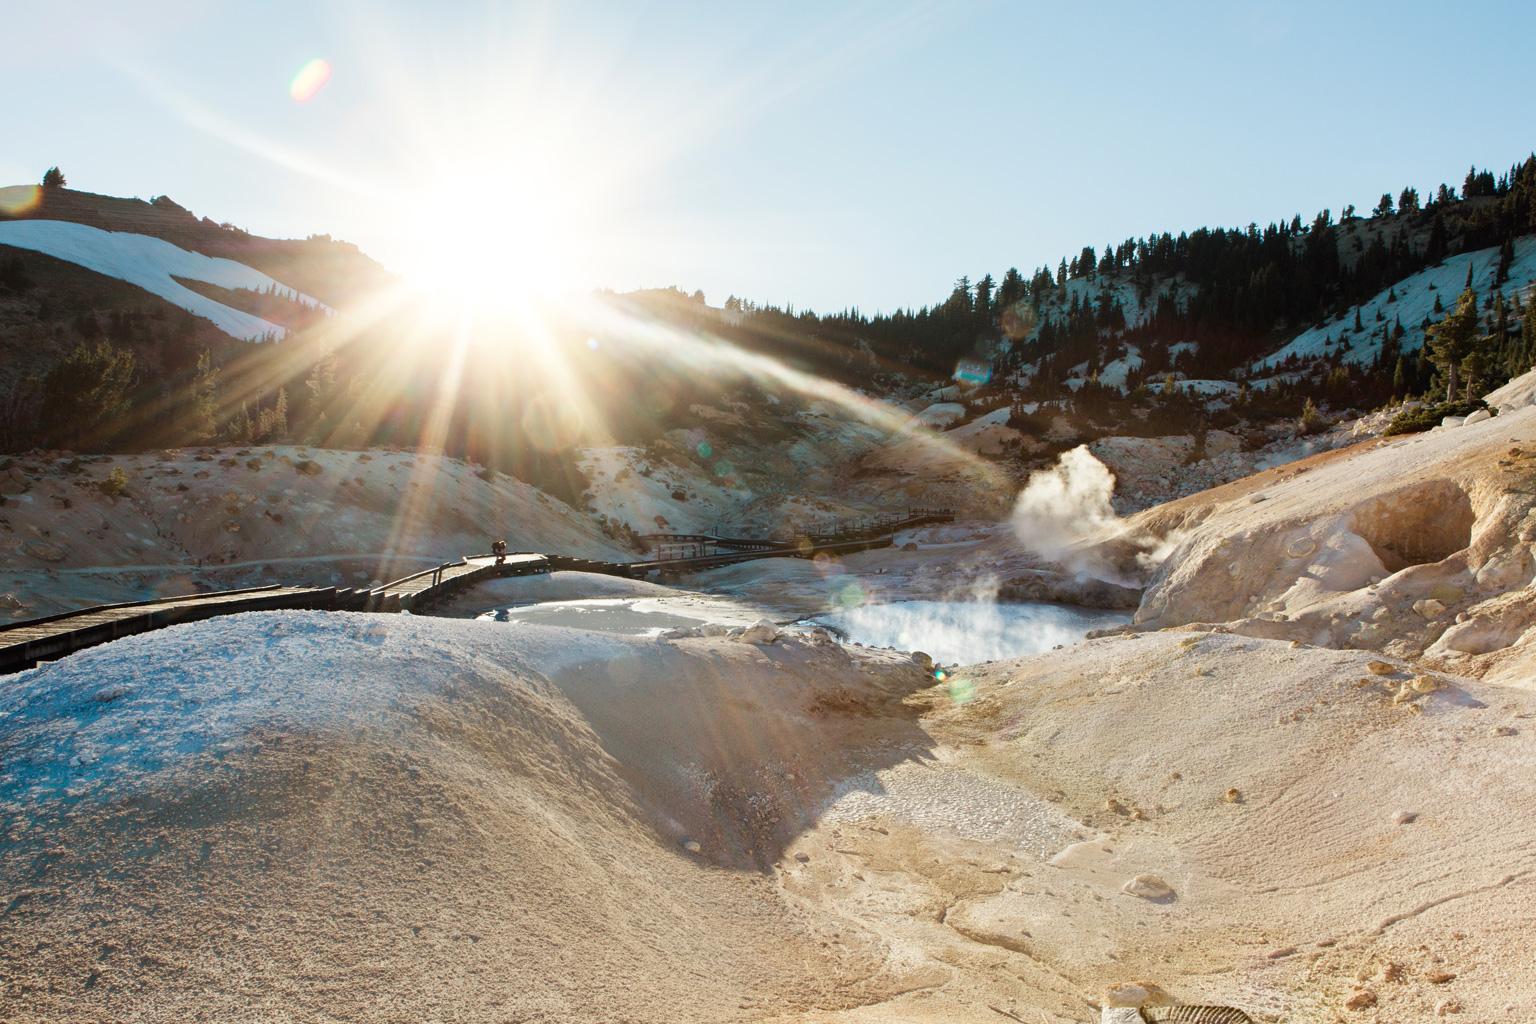 CindyGiovagnoli_Lassen_Volcanic_National_Park_California_camp_road_trip-017.jpg